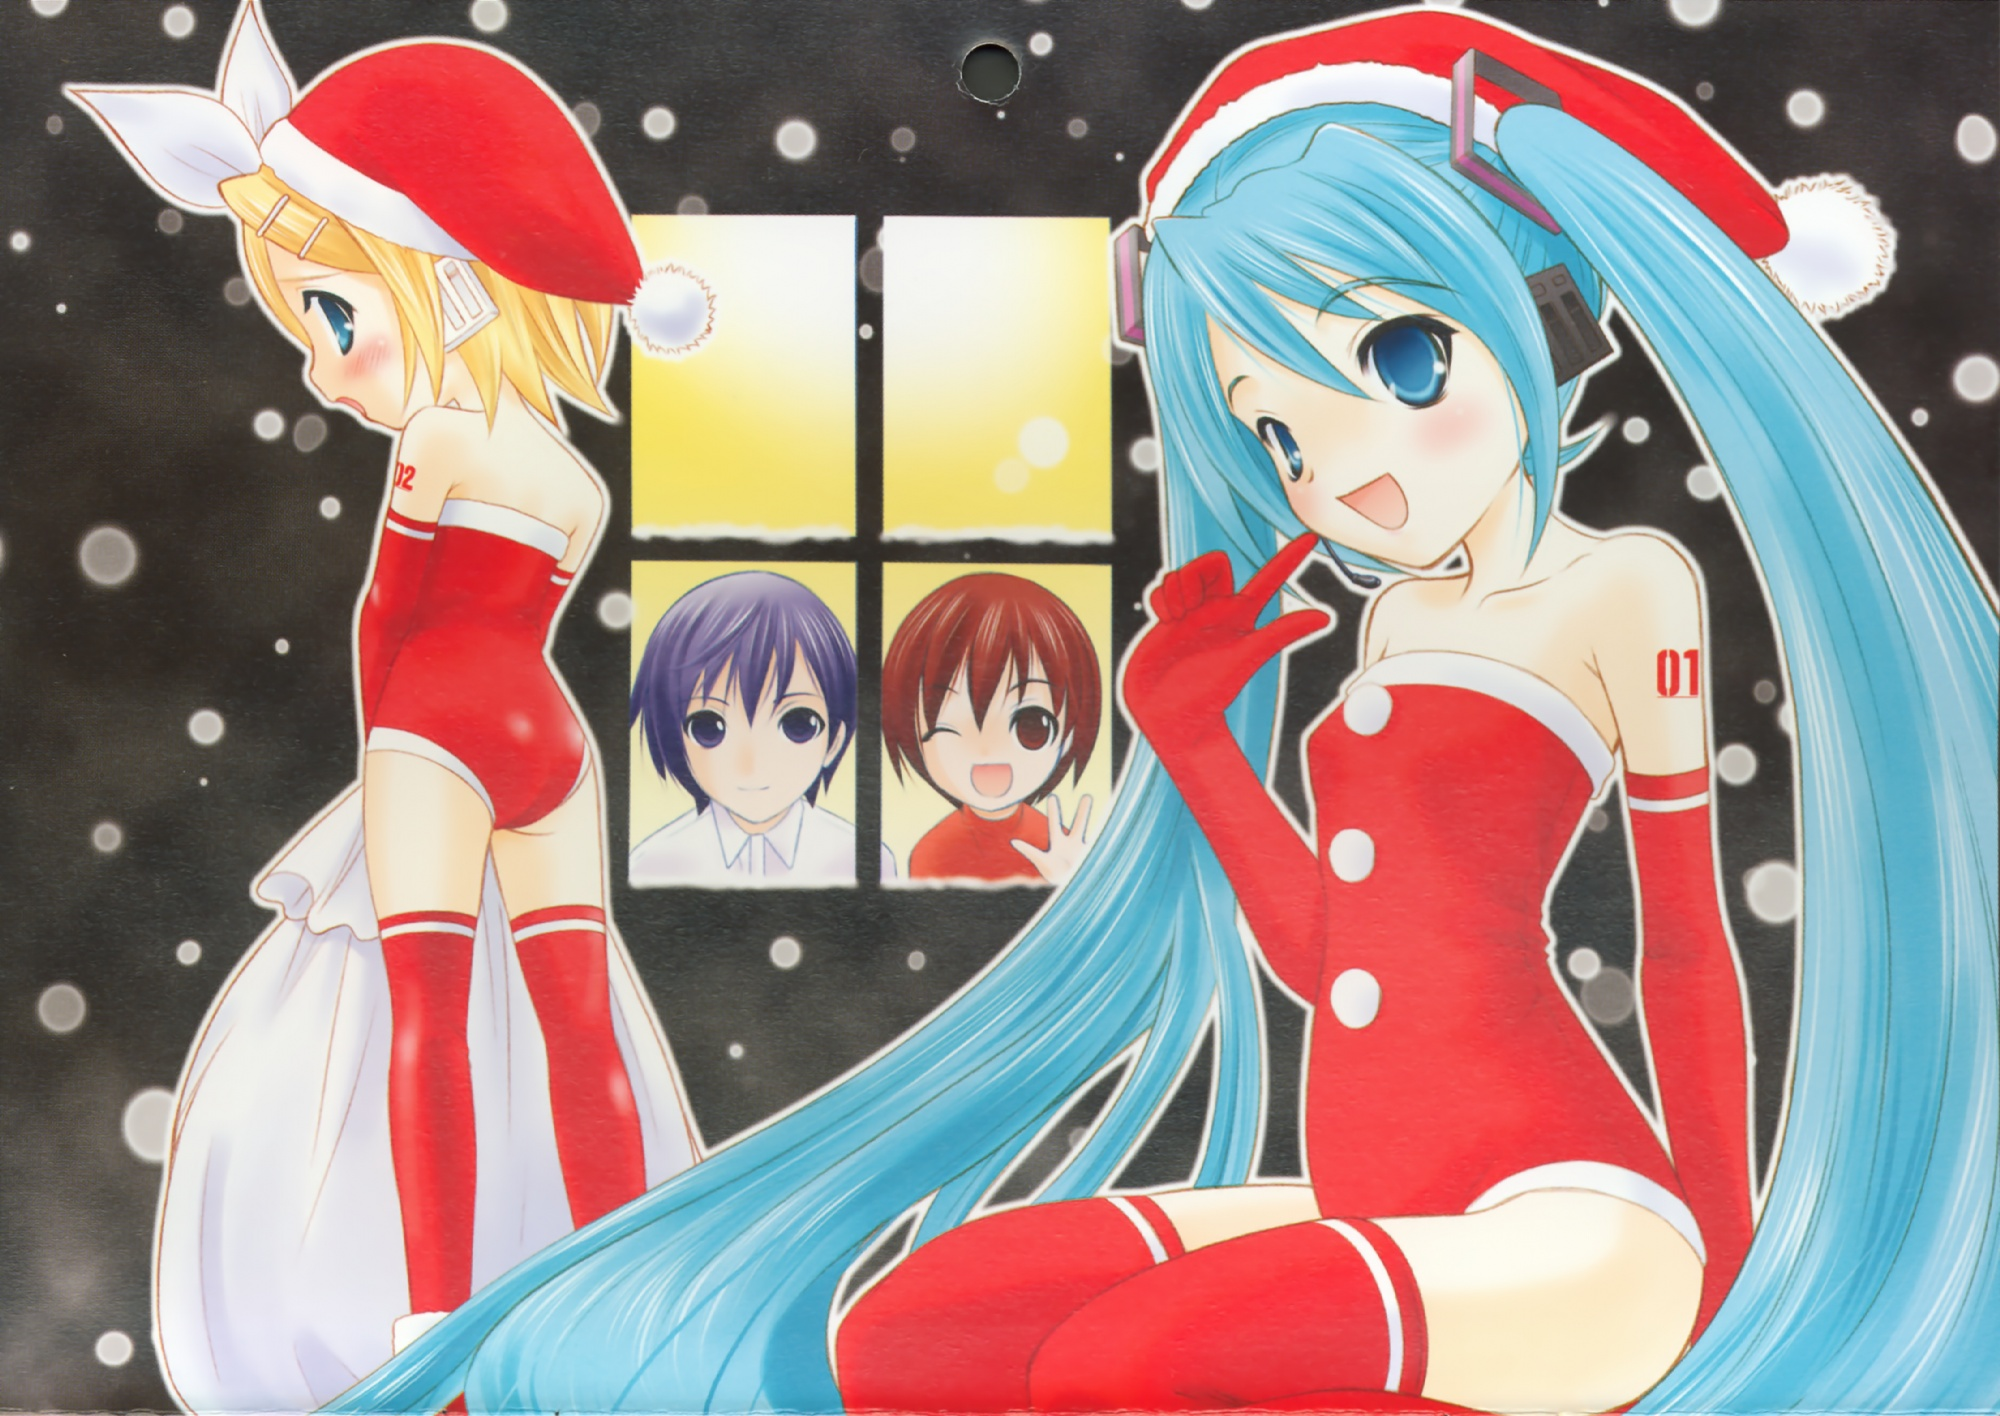 blue_hair christmas group hat hatsune_miku kagamine_rin kaito male meiko santa_costume santa_hat snow thighhighs vocaloid winter